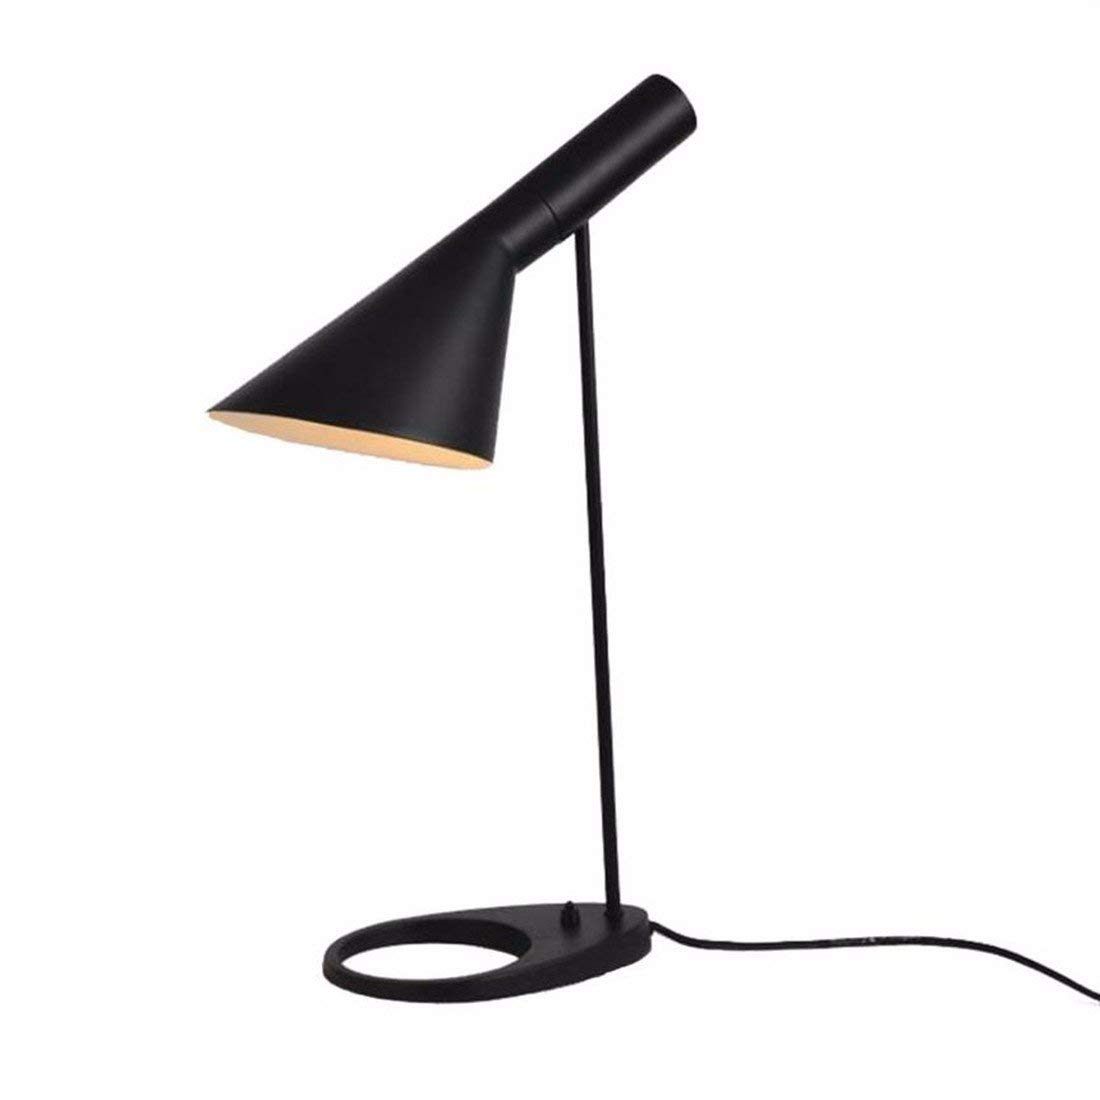 QPGGP-Table Lamp Modern Minimalist Desk Lamp Button Type Study Bedroom Bedside Led Desk Lamp Creative Desk Lamp